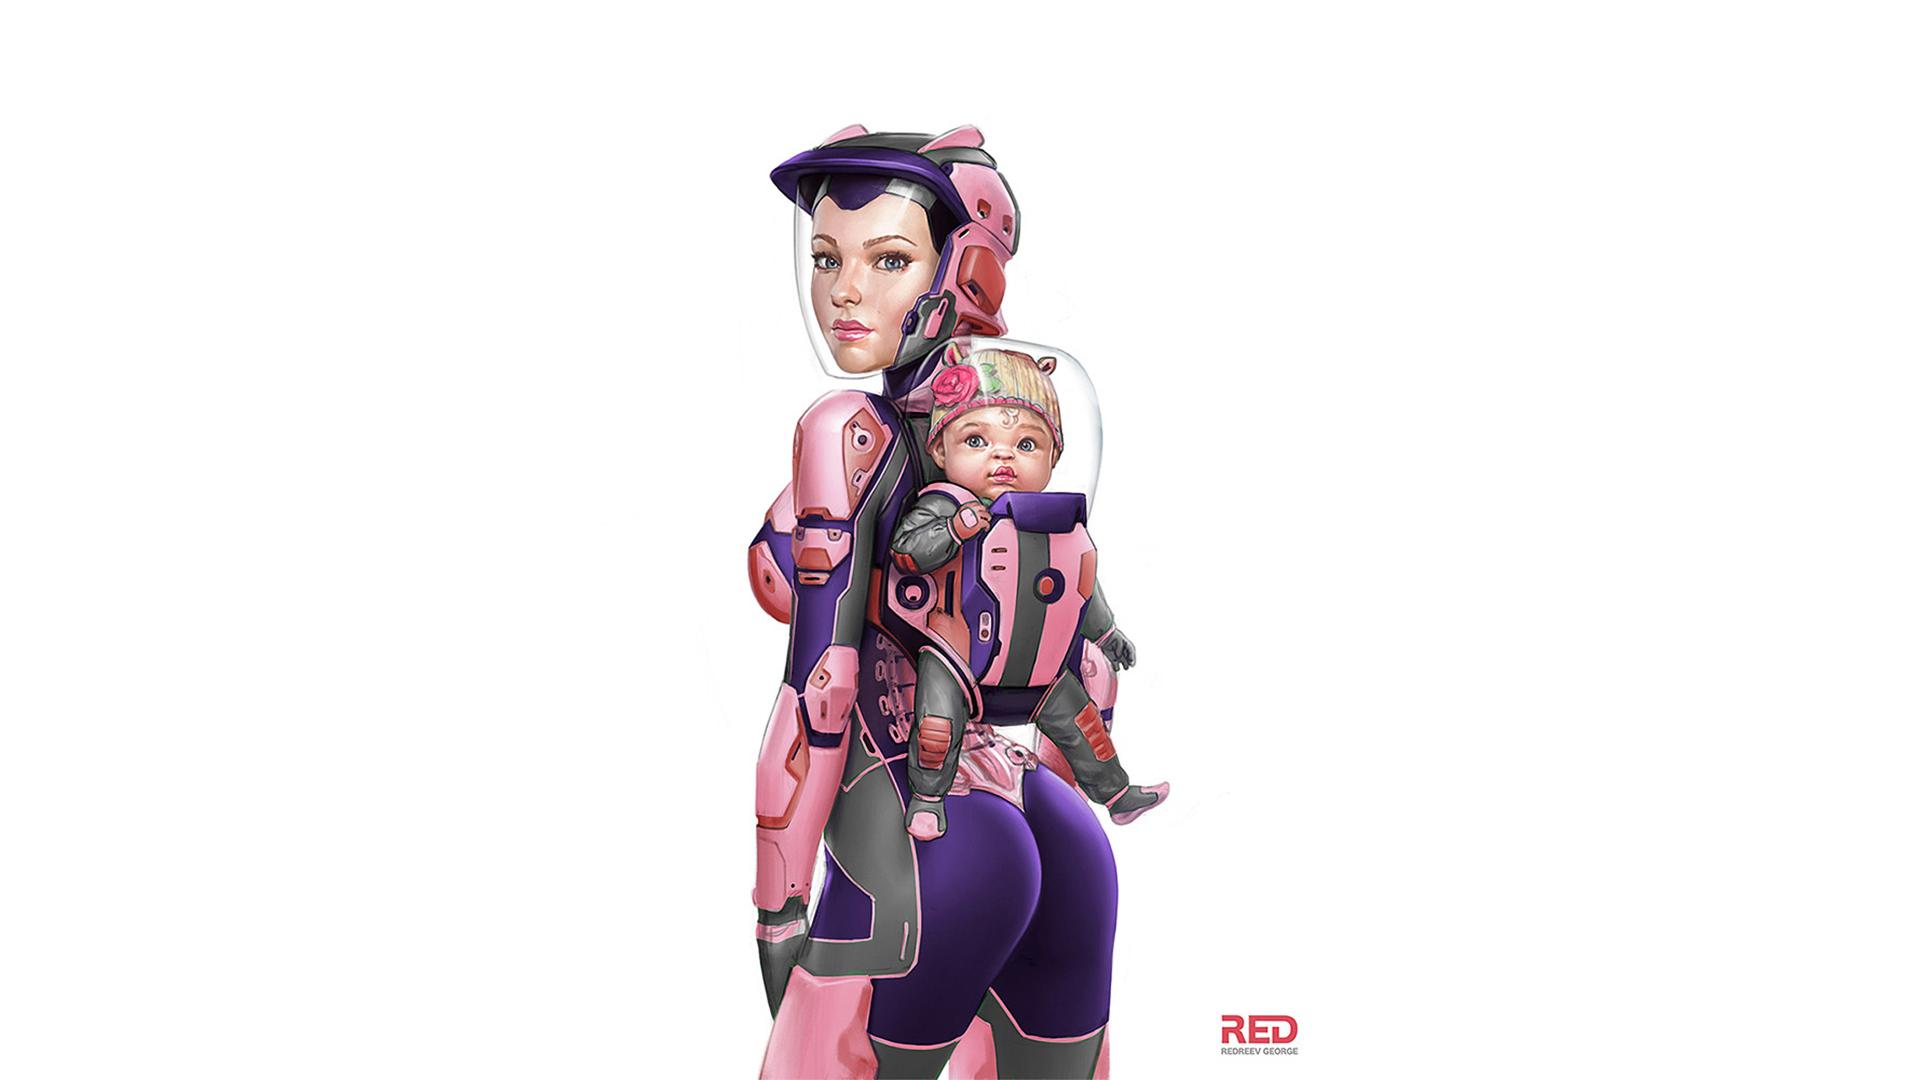 Wallpaper George Redreev Futuristic Baby White Blank Pink